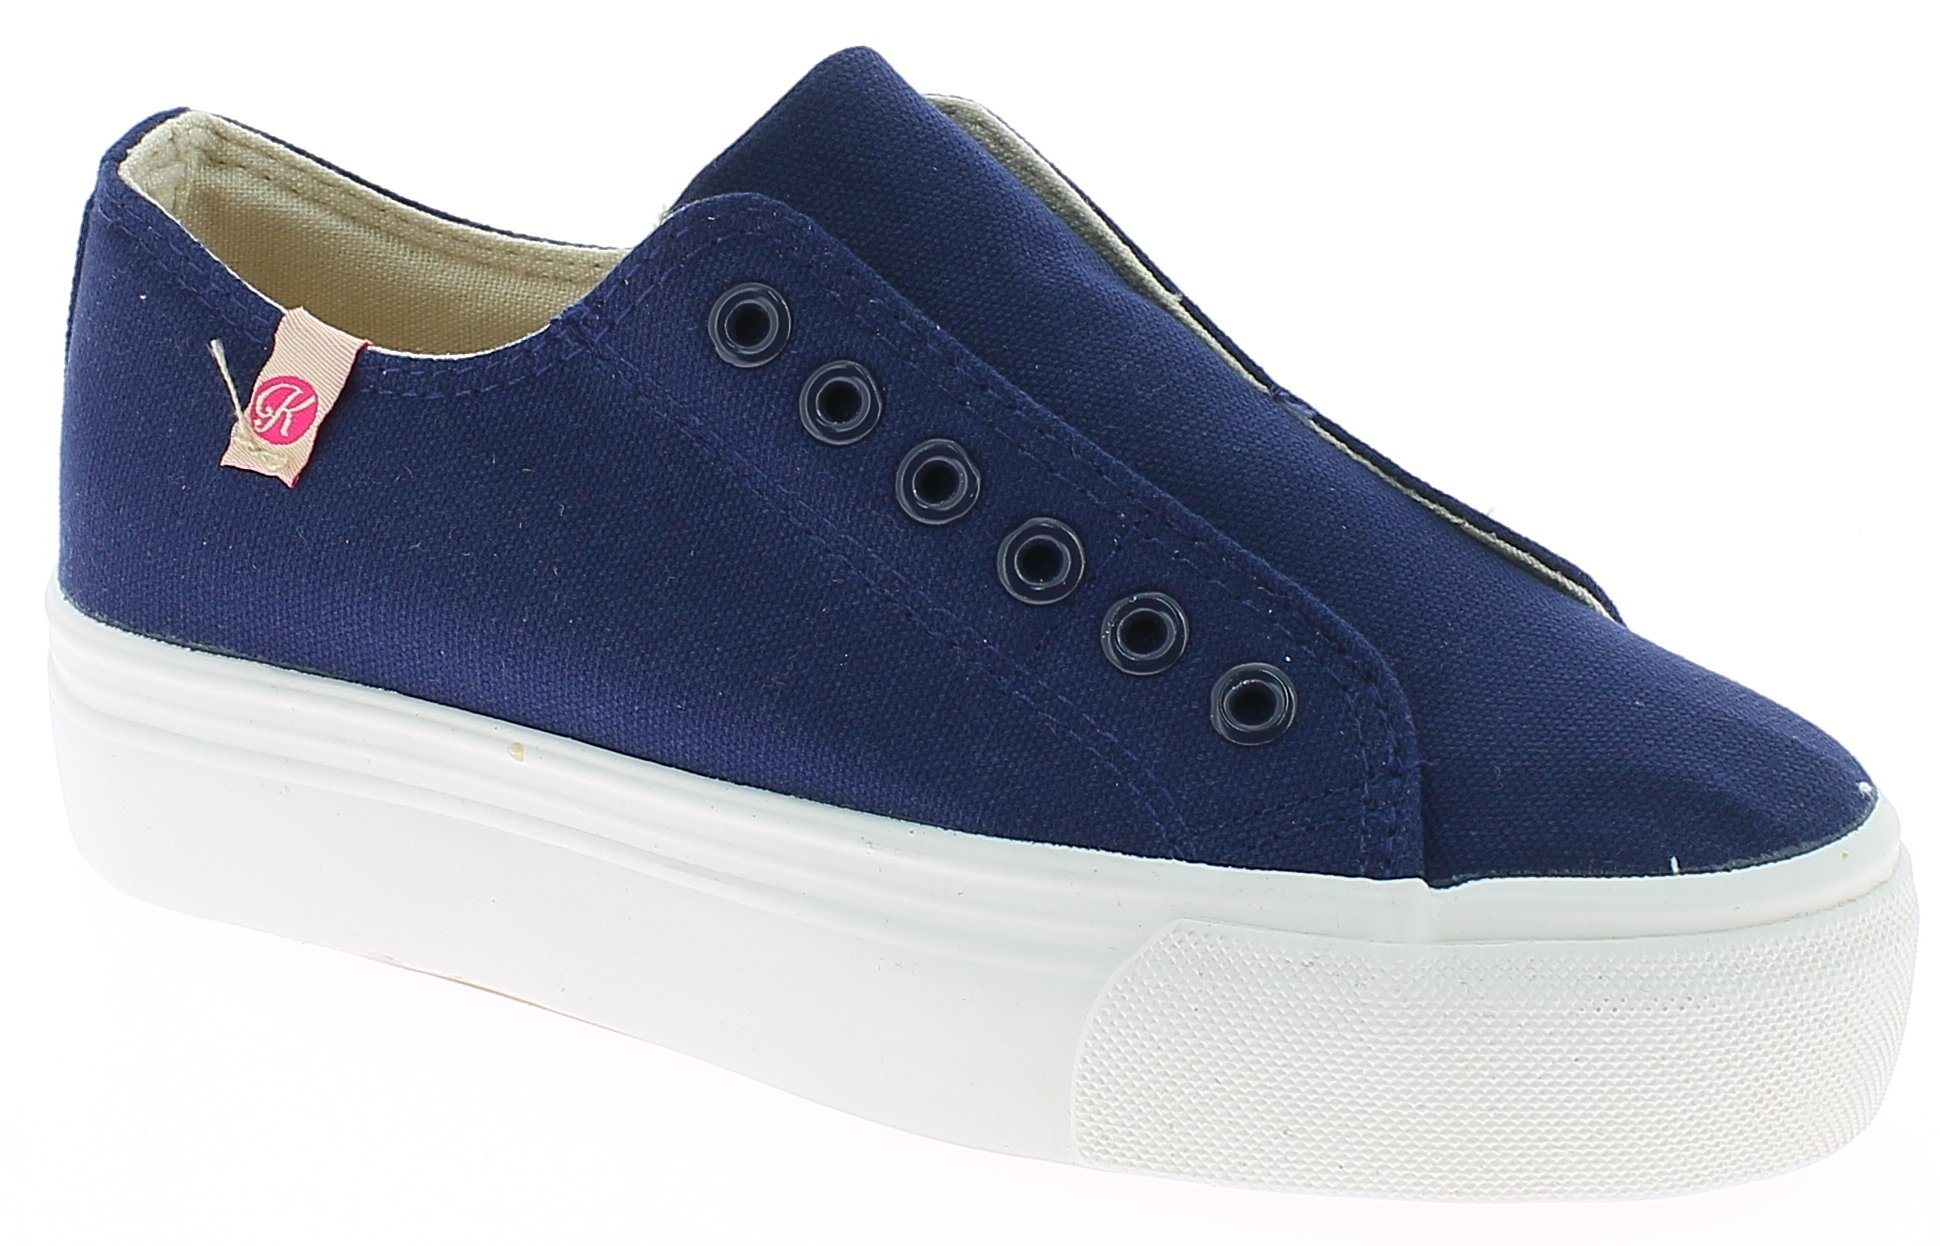 IQSHOES Γυναικείο Casual 1520005 Μπλε - IqShoes - 1520005 BLUE blue 39/1/23/25 παπούτσια  προσφορεσ